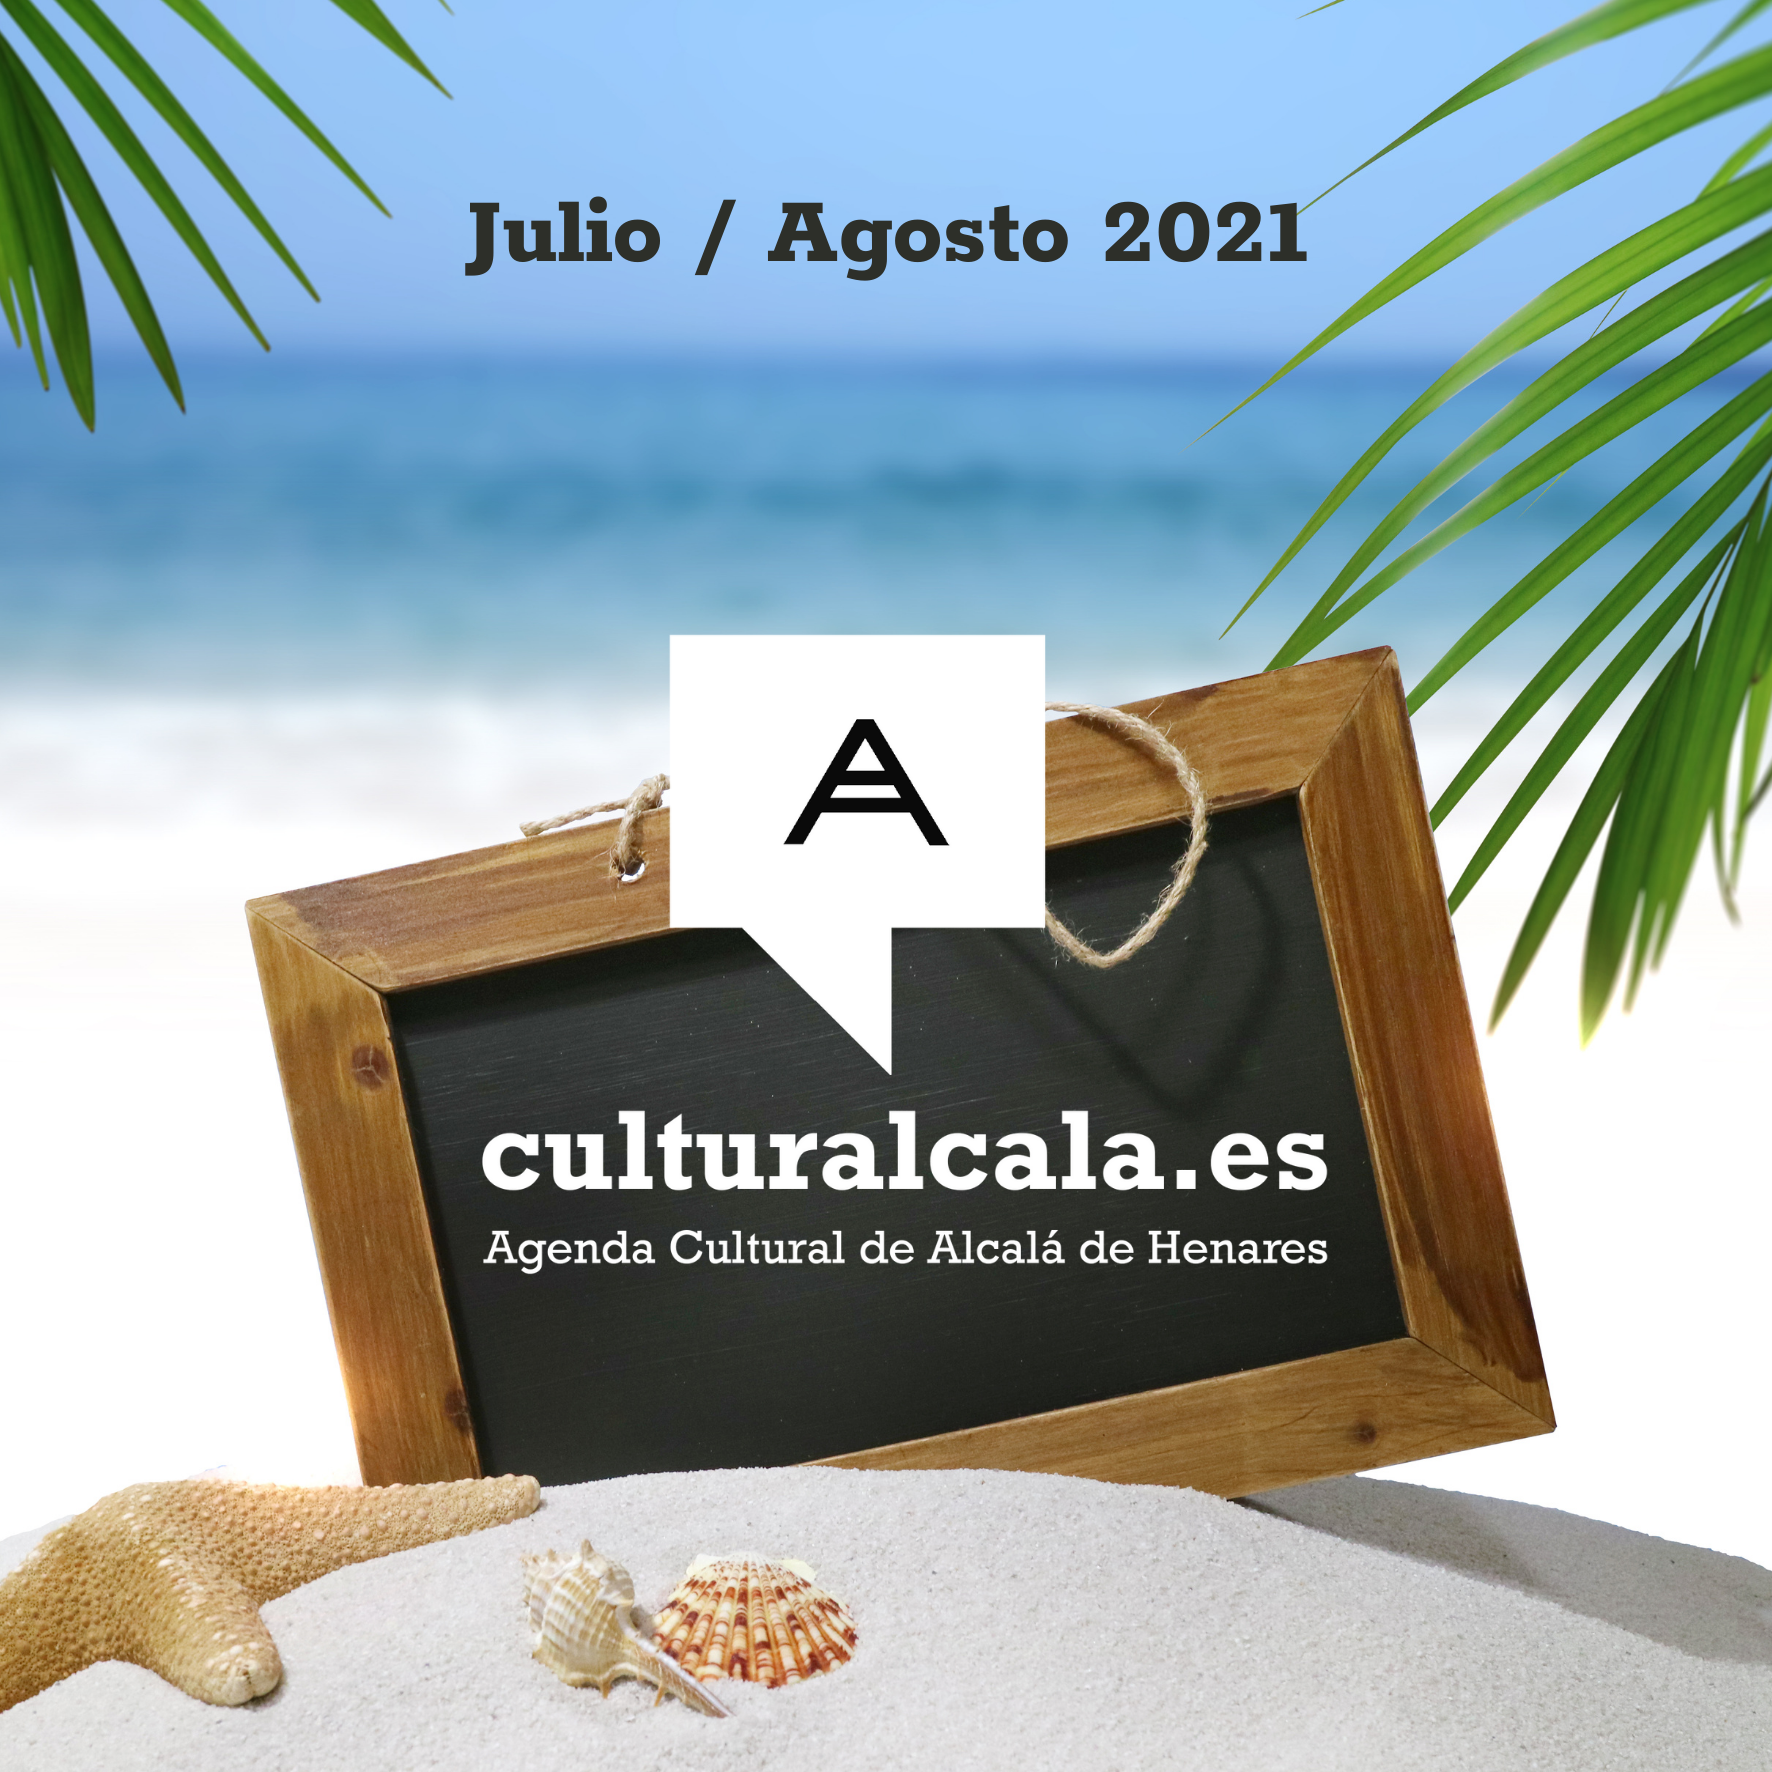 Julio / Agosto 2021